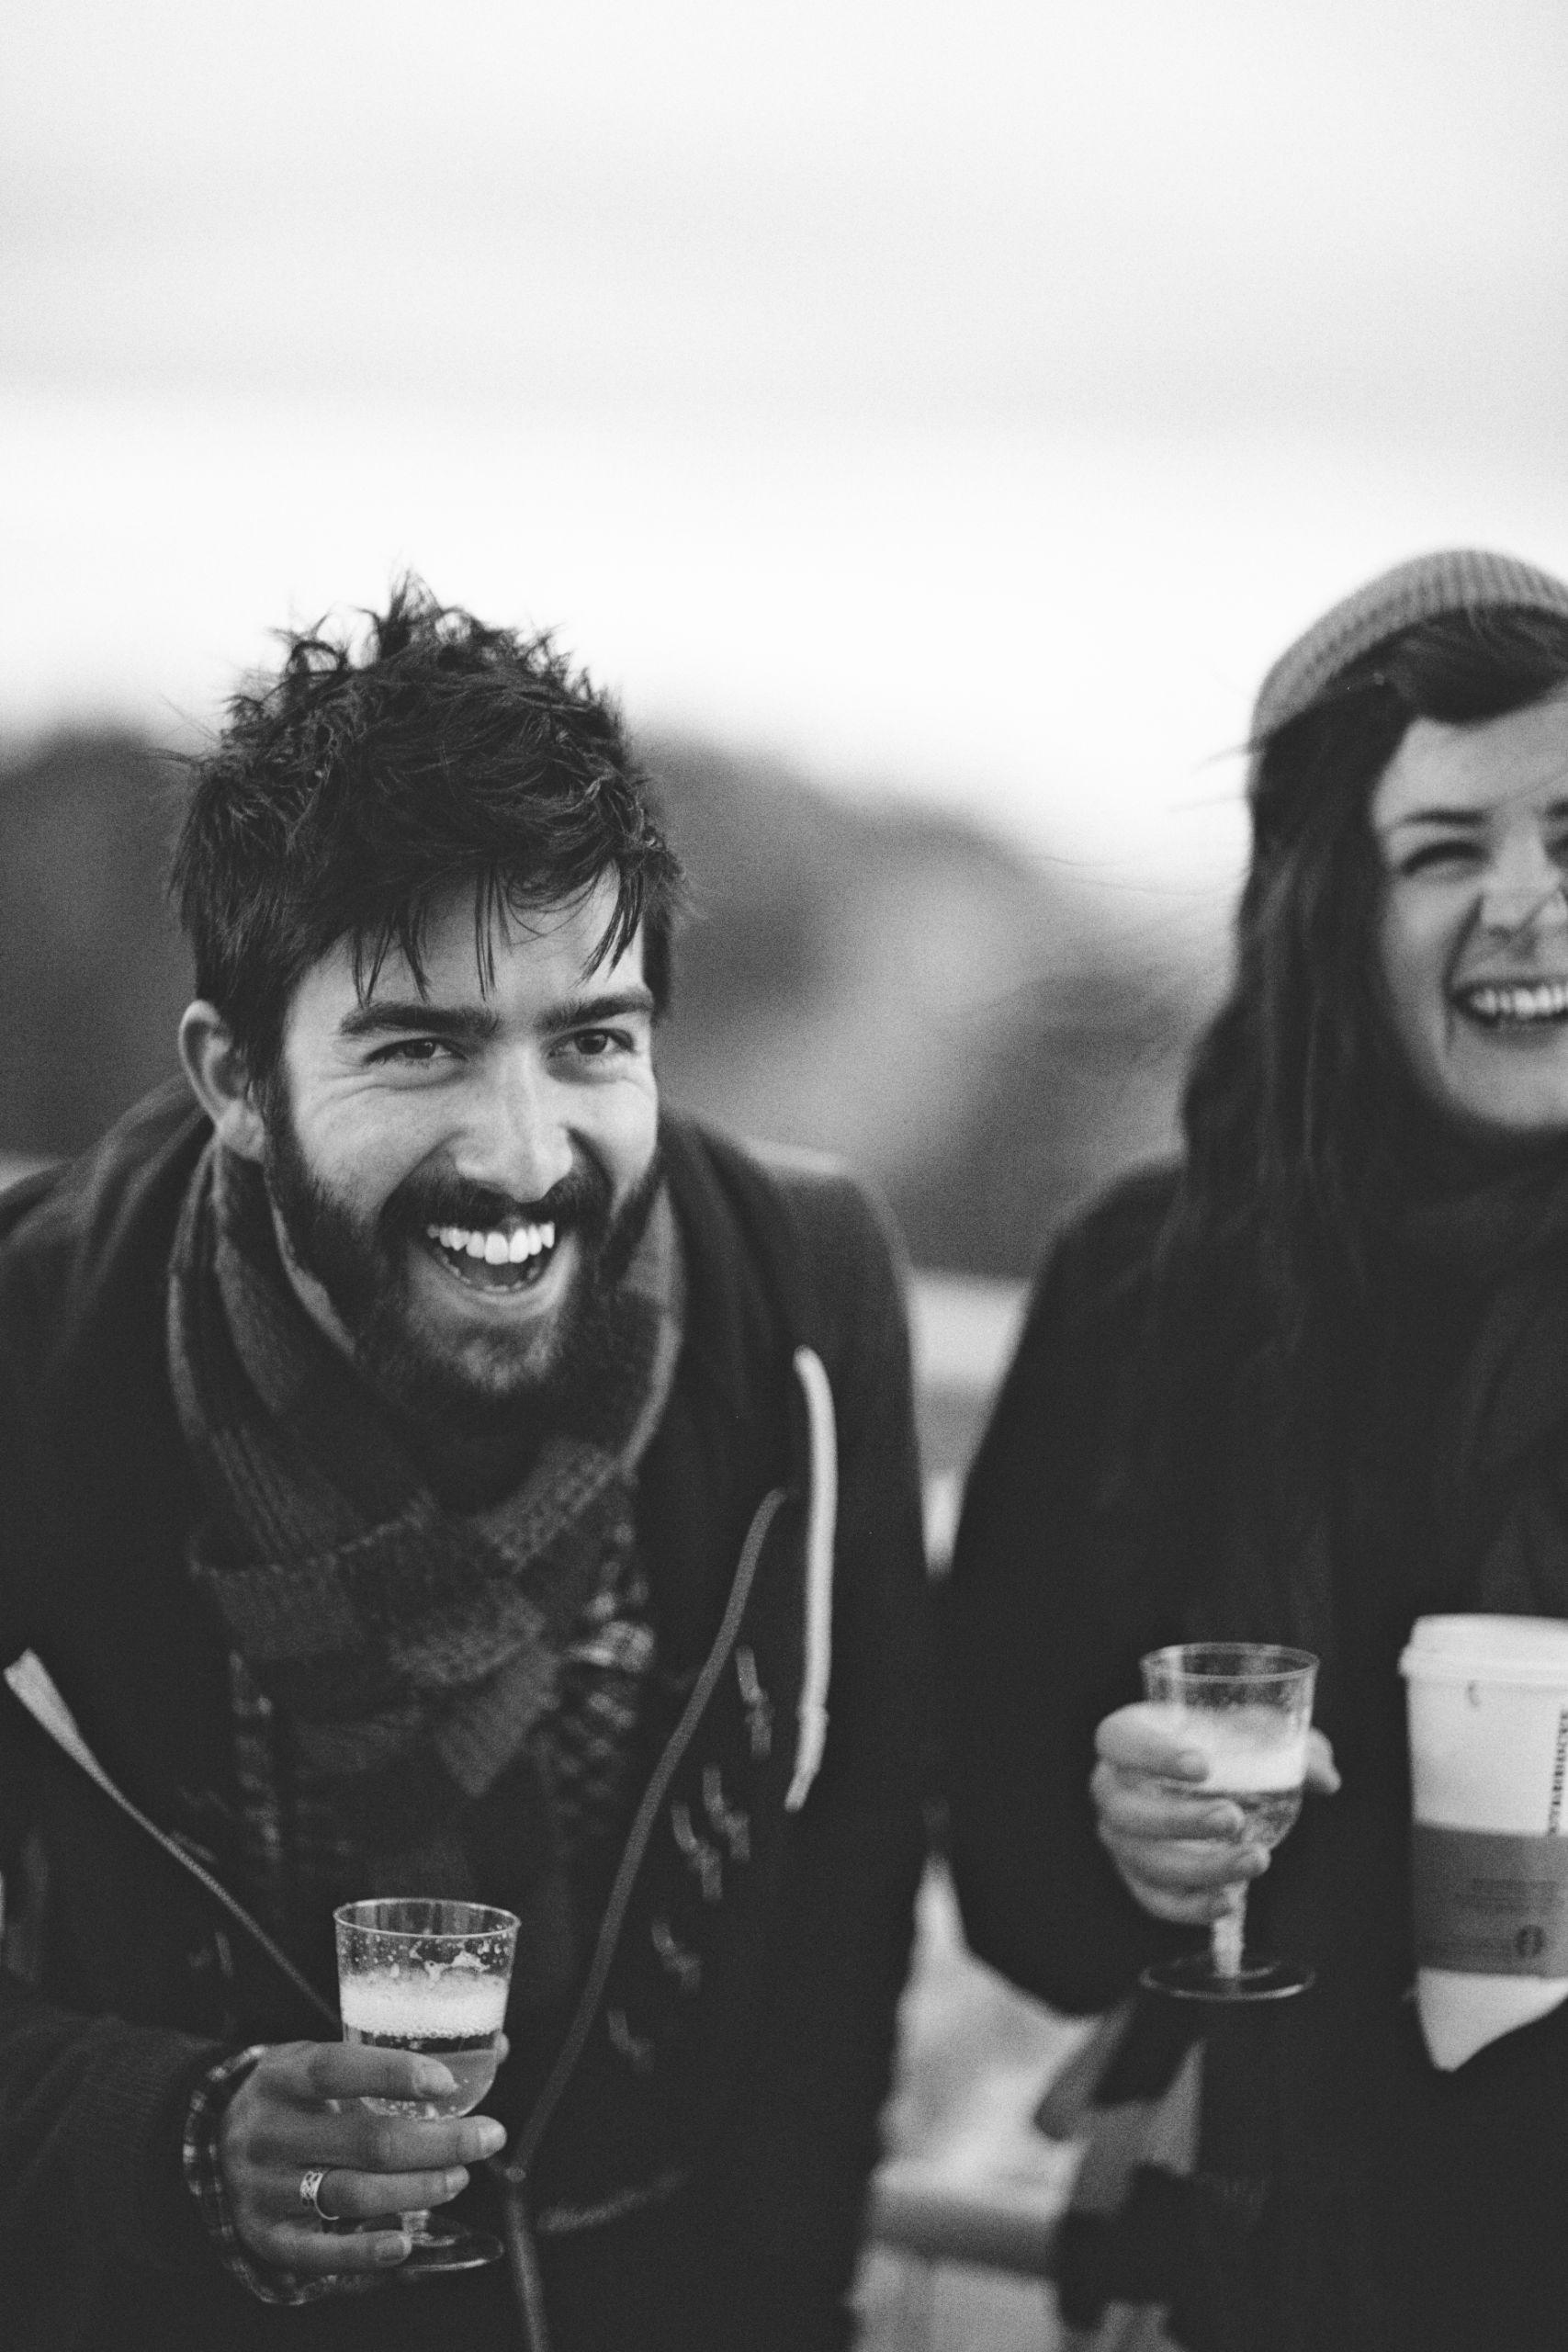 Image 8 of Brannon and Natasha | Proposal at the Balloon Fiesta